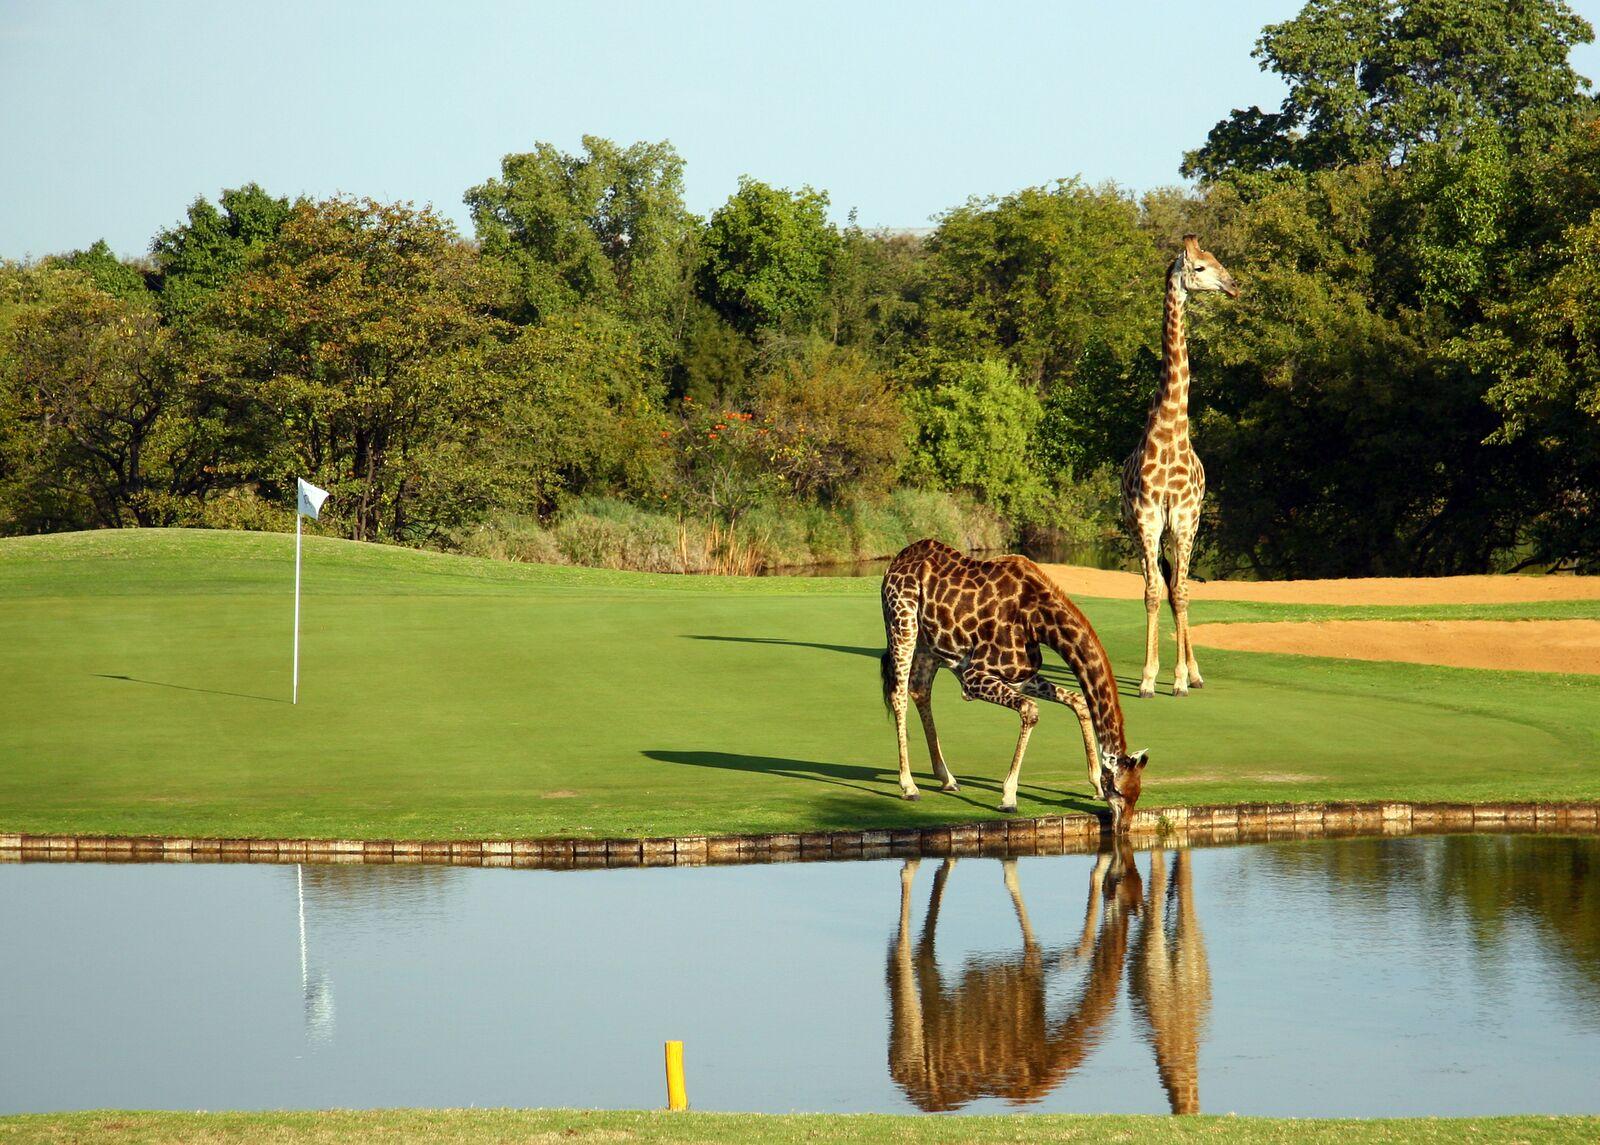 golf in the wild with giraffe